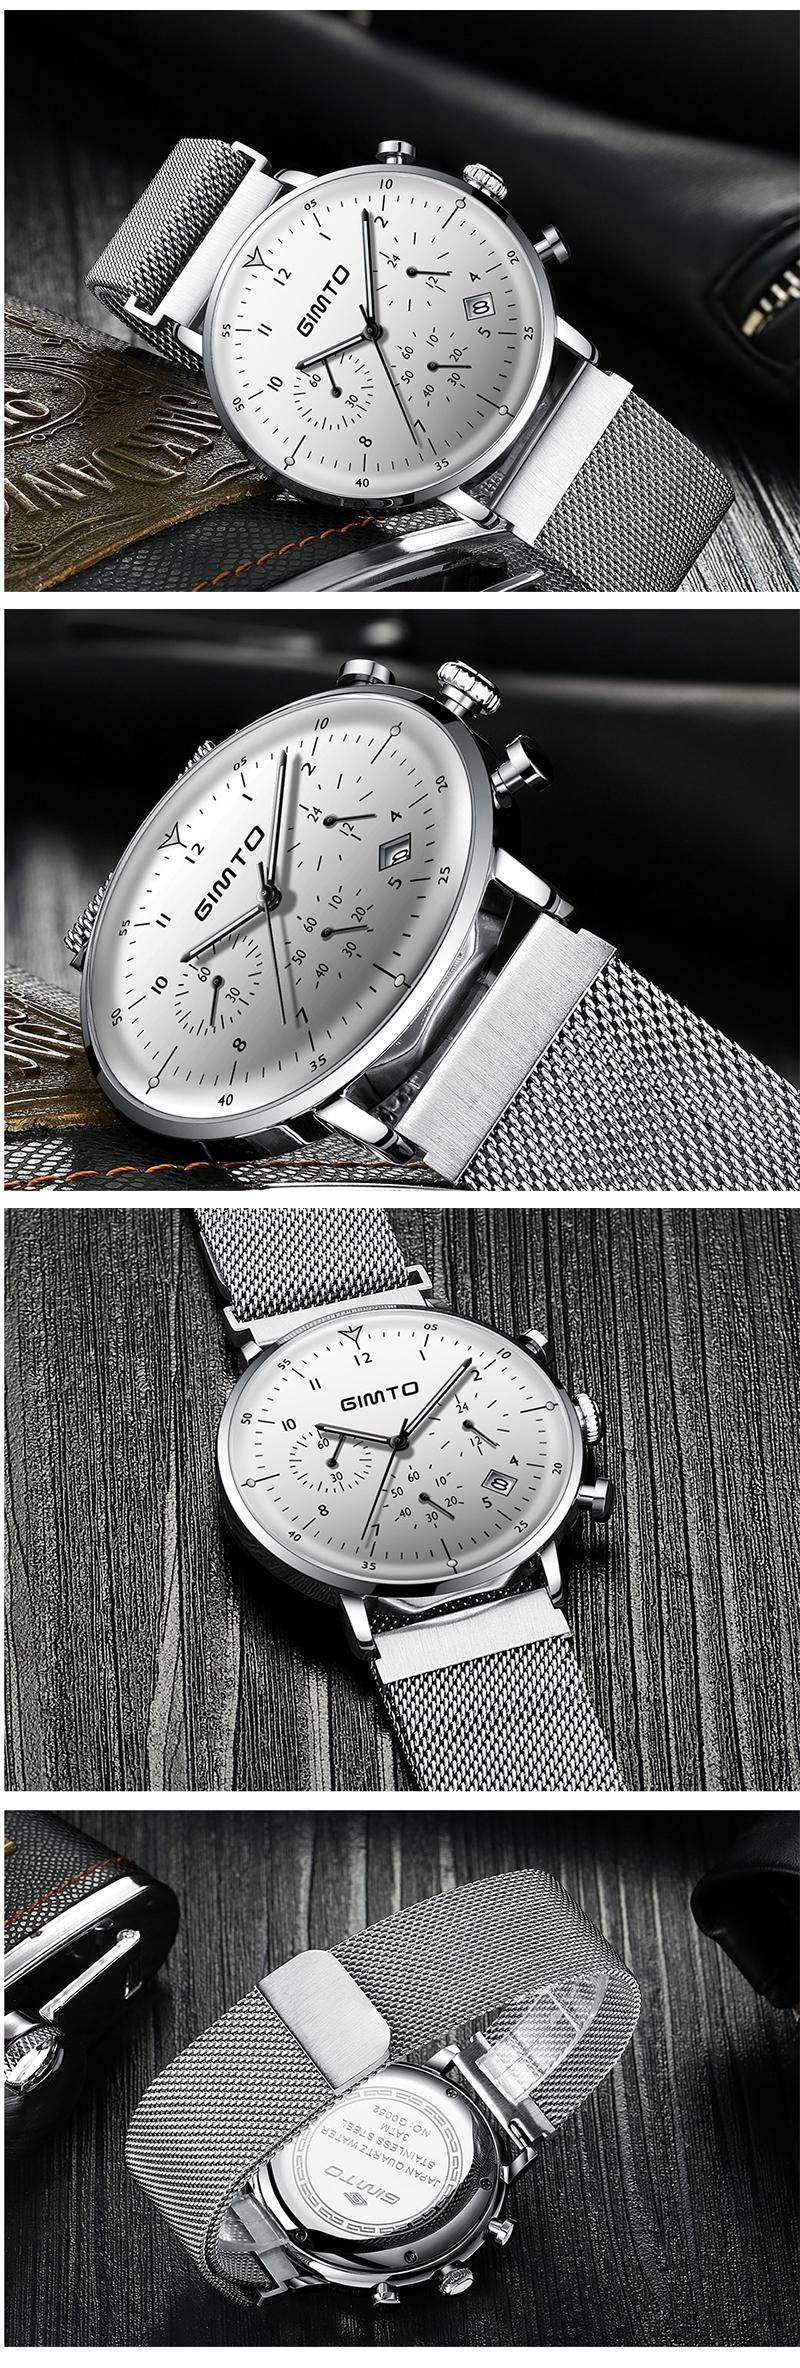 GIMTO GM245 Luminous Display Stainless Steel Quartz Watch